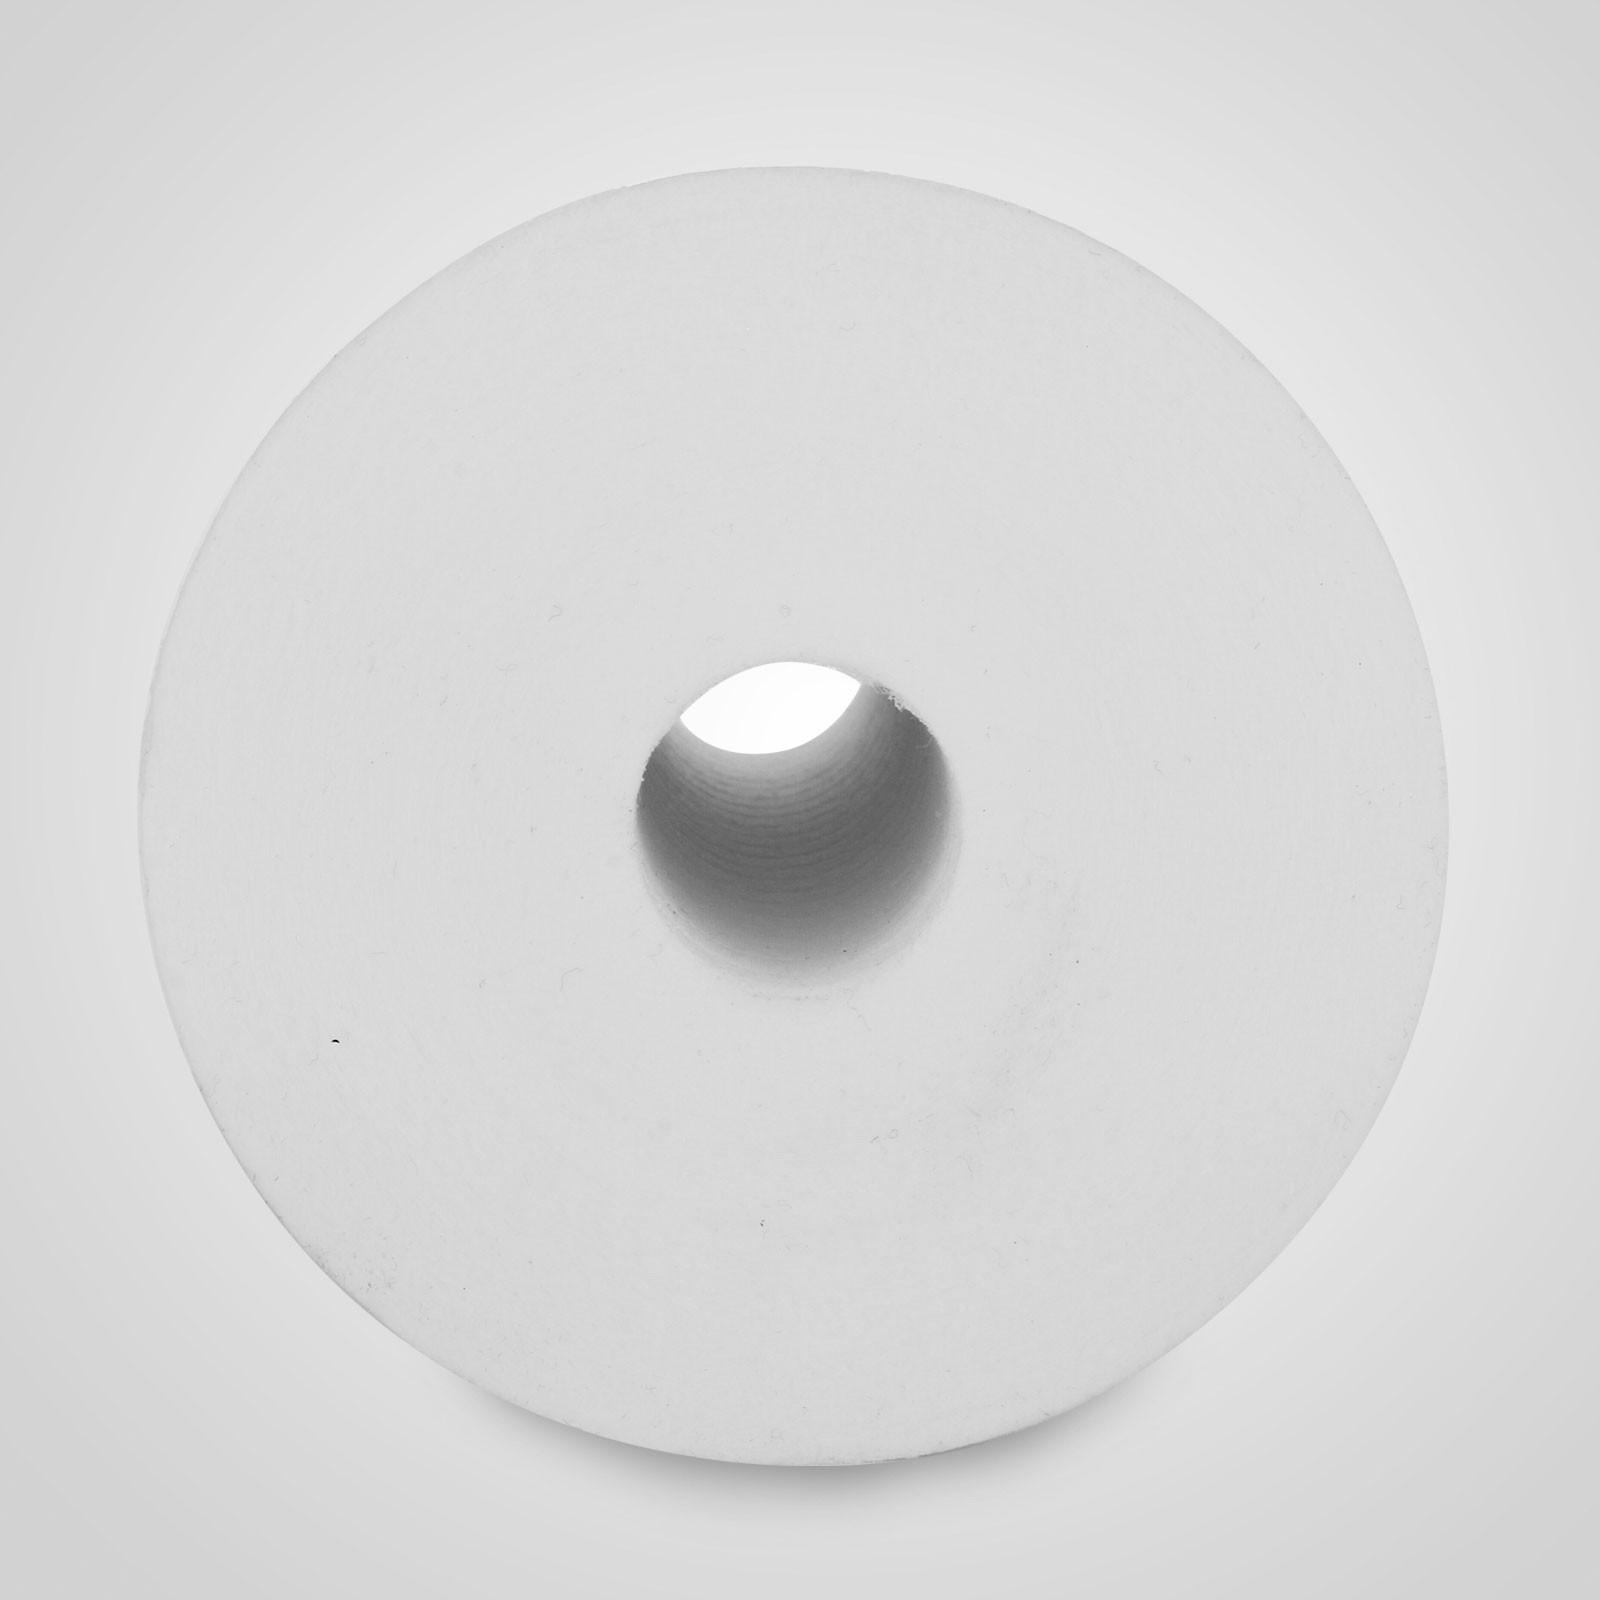 20Pcs-Cartouche-Filtrante-5-Micron-10-034-X-4-5-034-as-Brita-Emballe-Individu-Bobine miniature 4